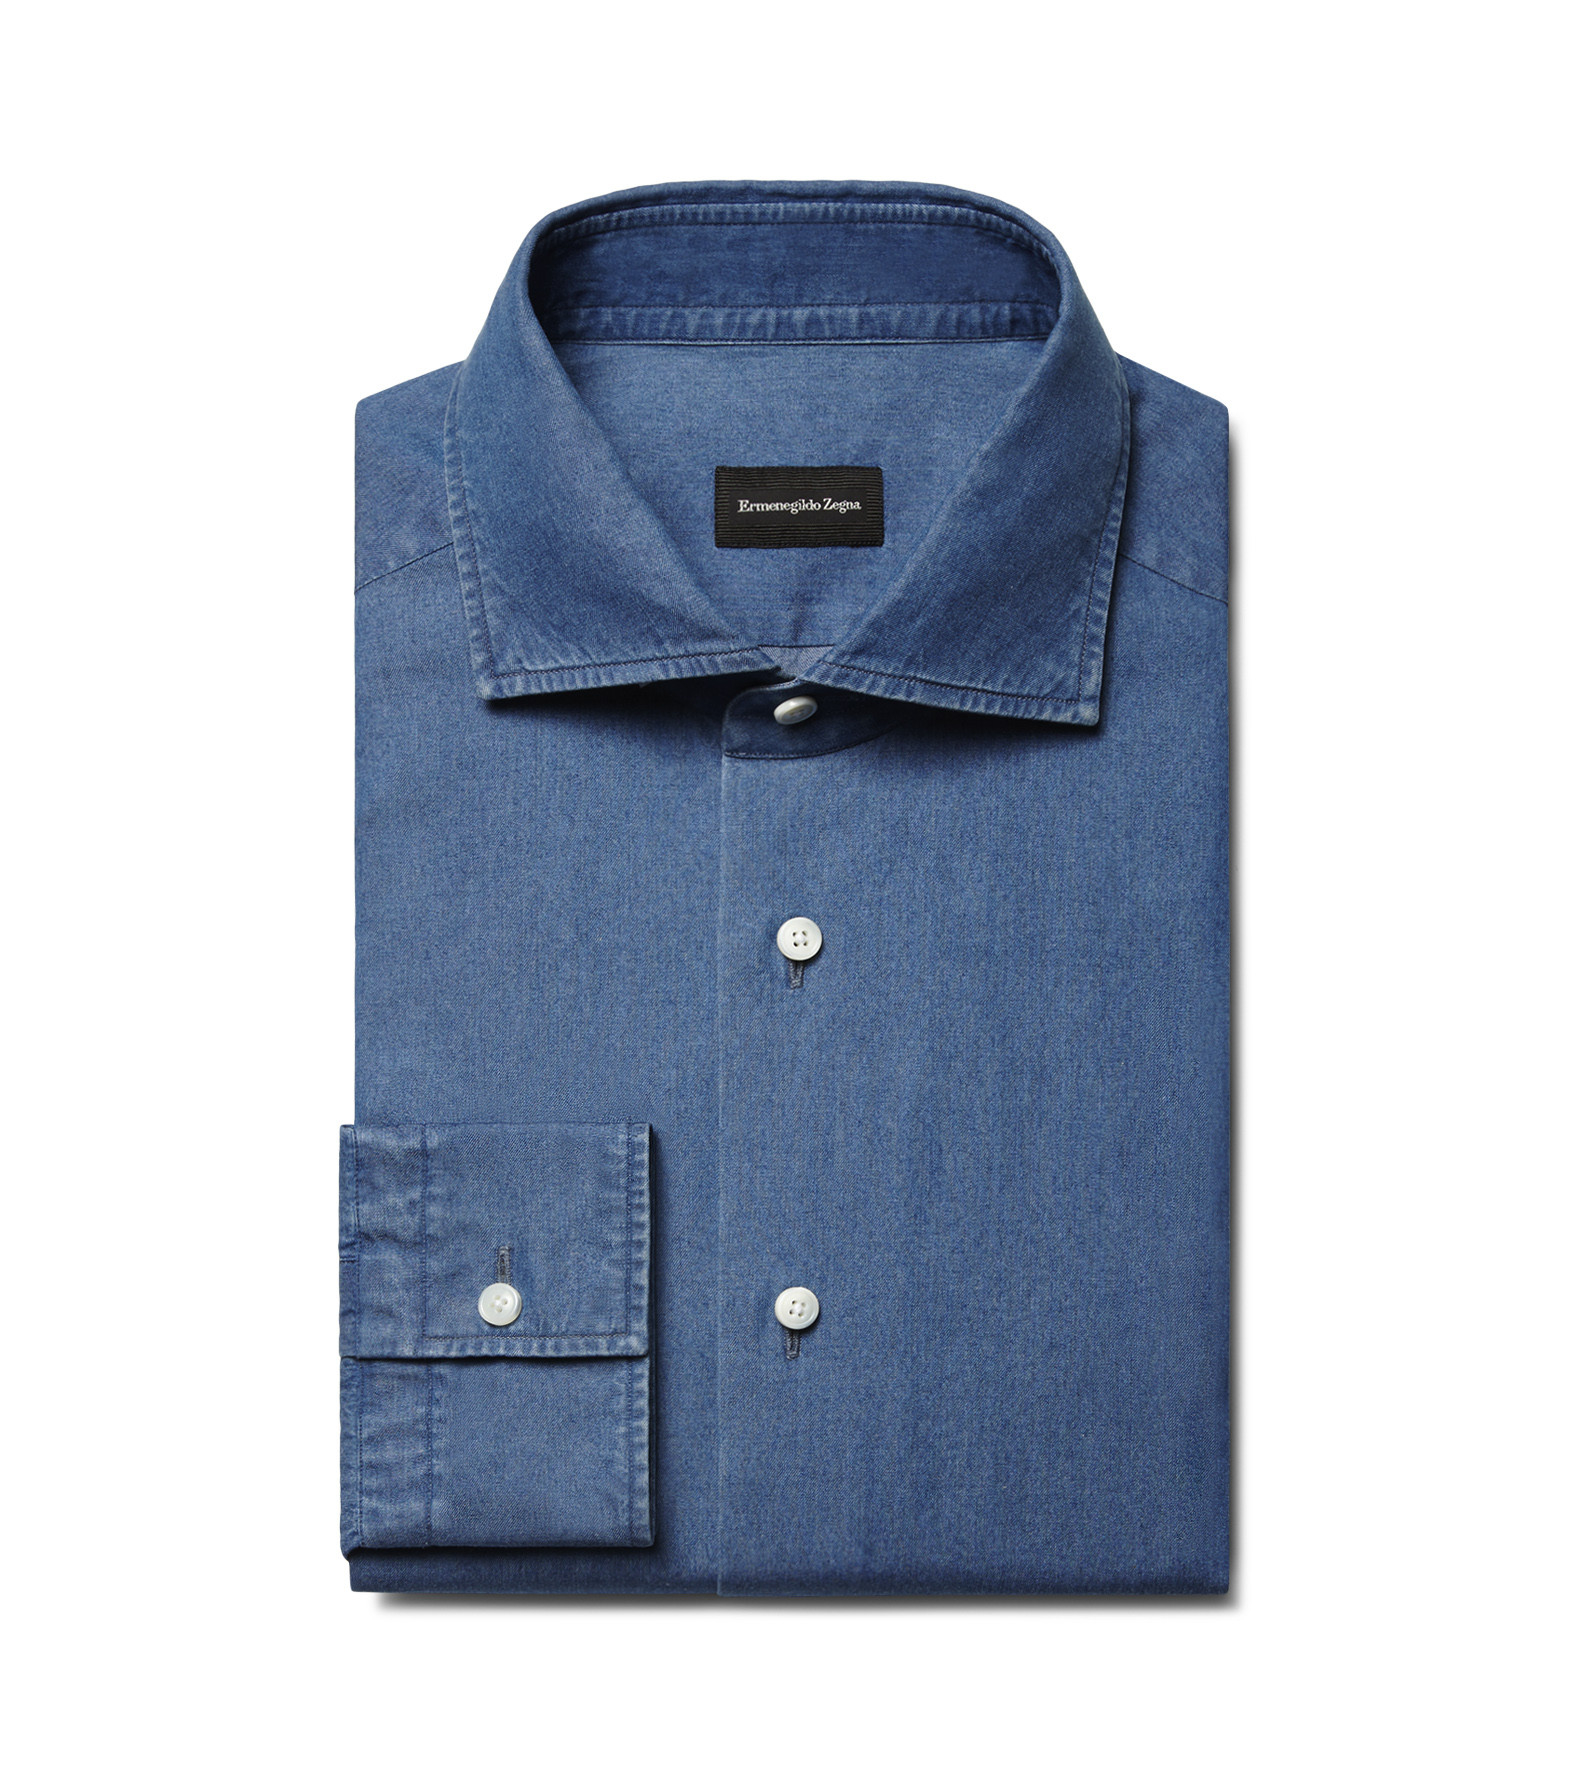 Ermenegildo Zegna Light Blue Denim Cotton Shirt In Blue